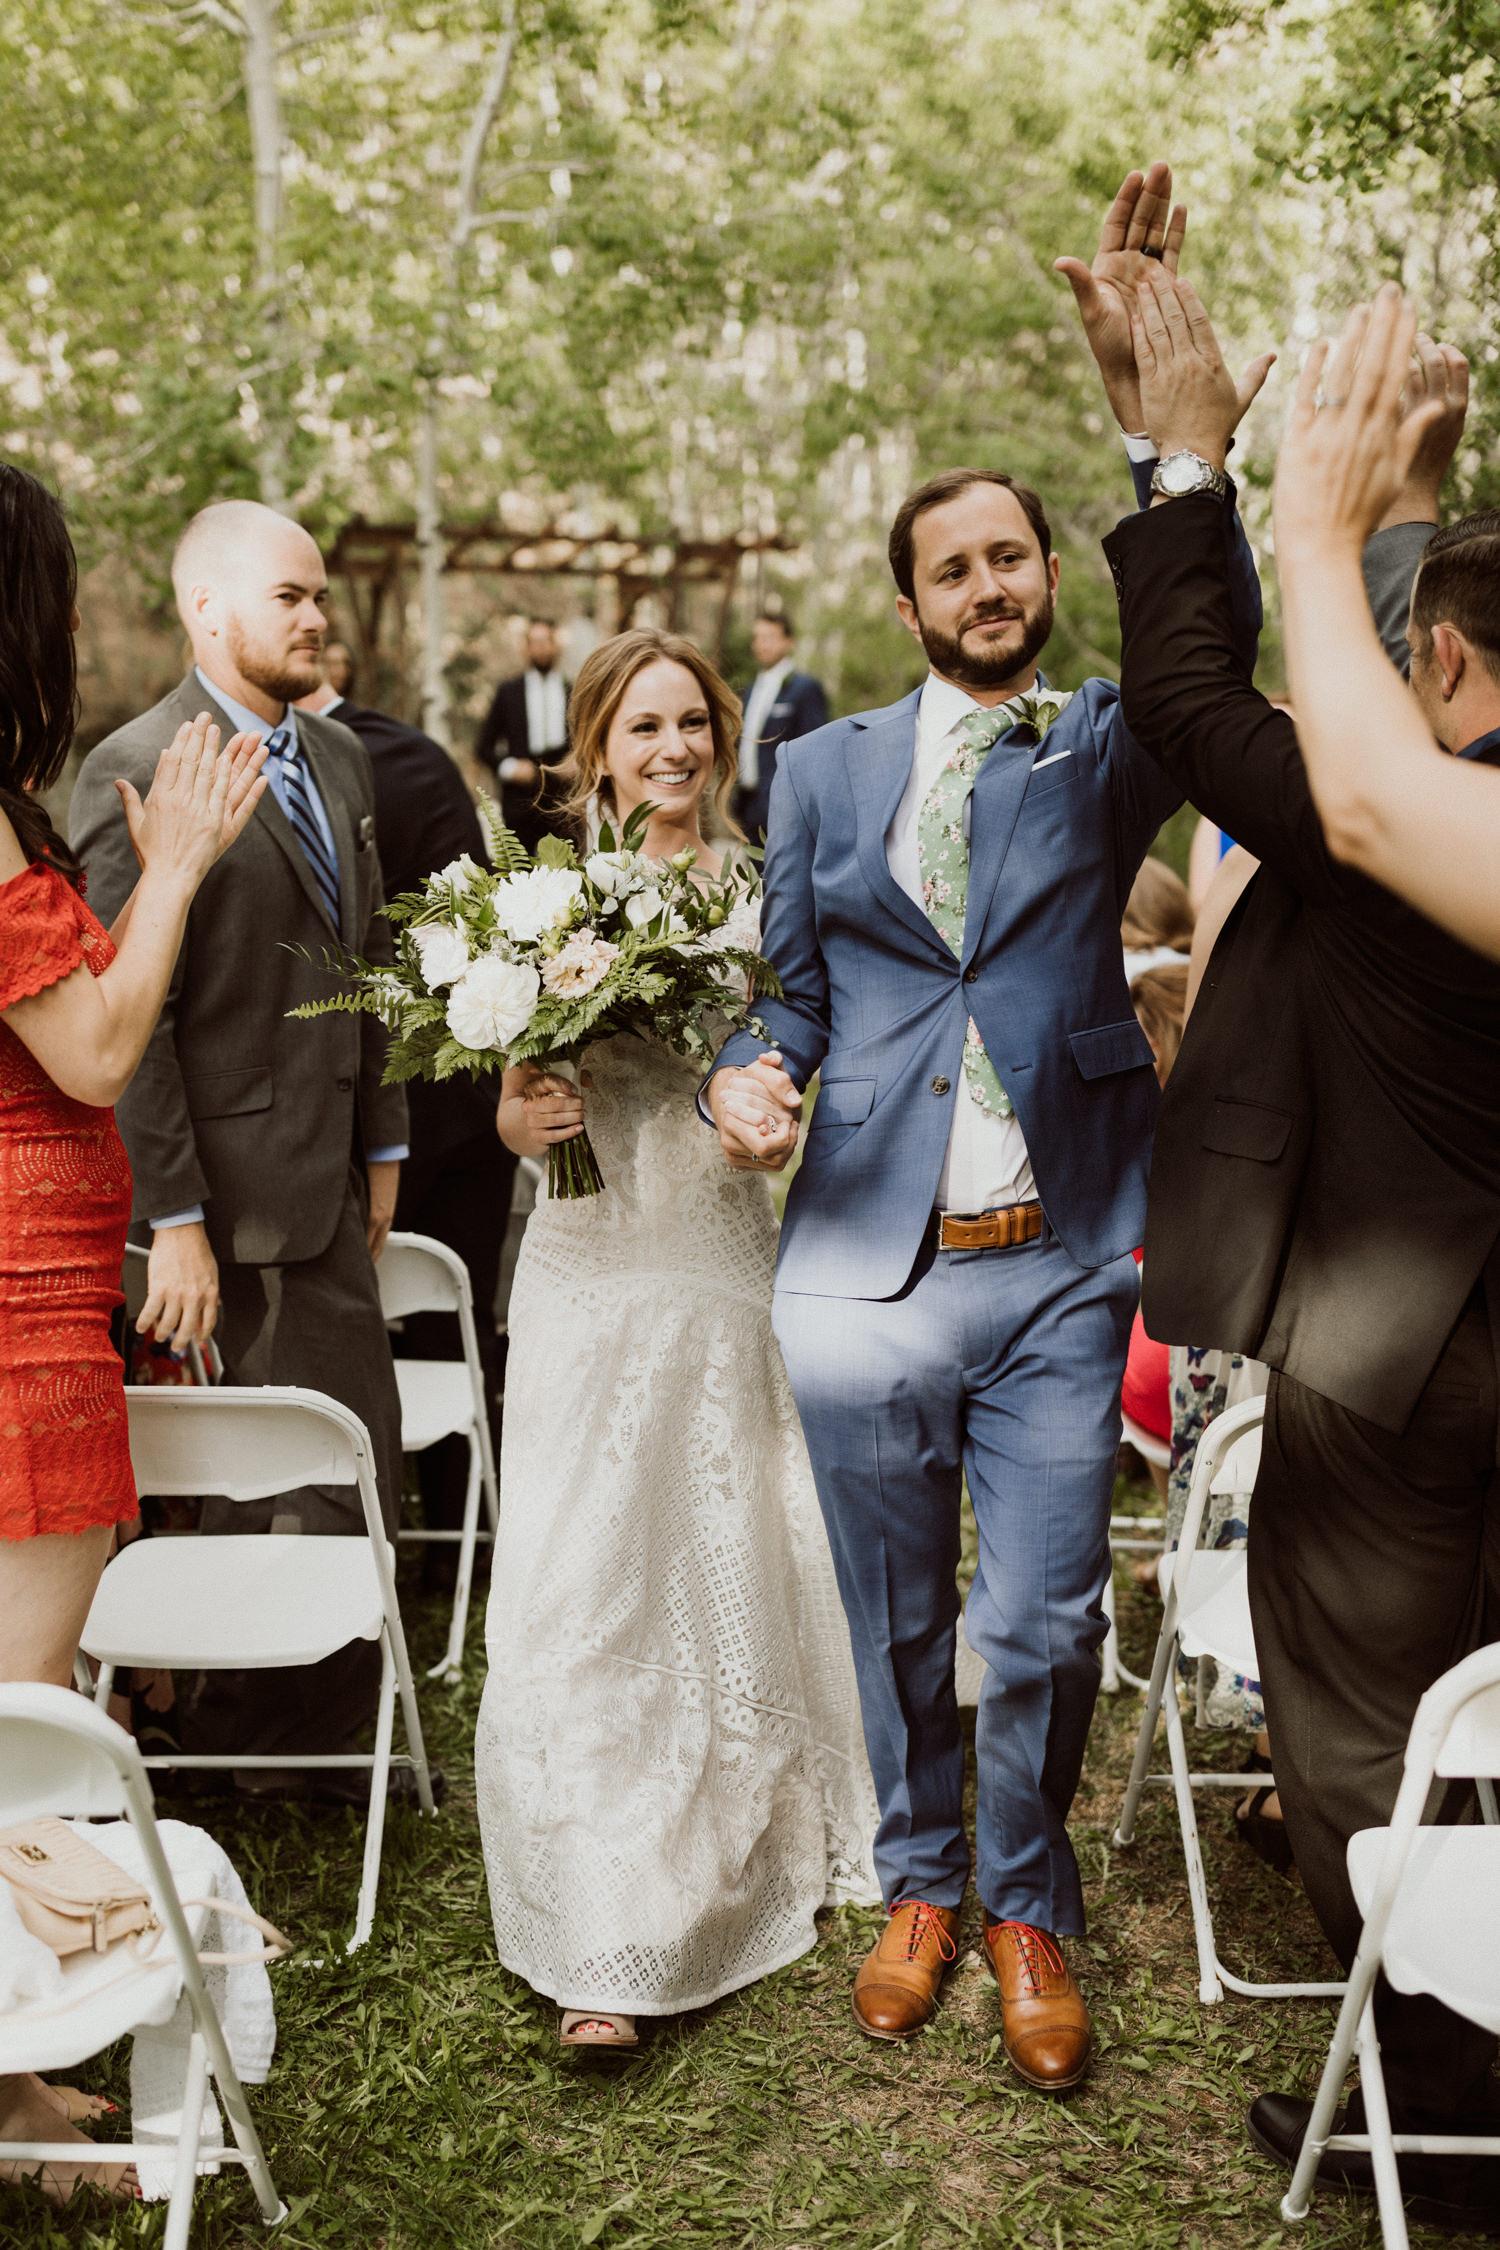 bohemian-backyard-wedding-breckenridge-colorado-90.jpg